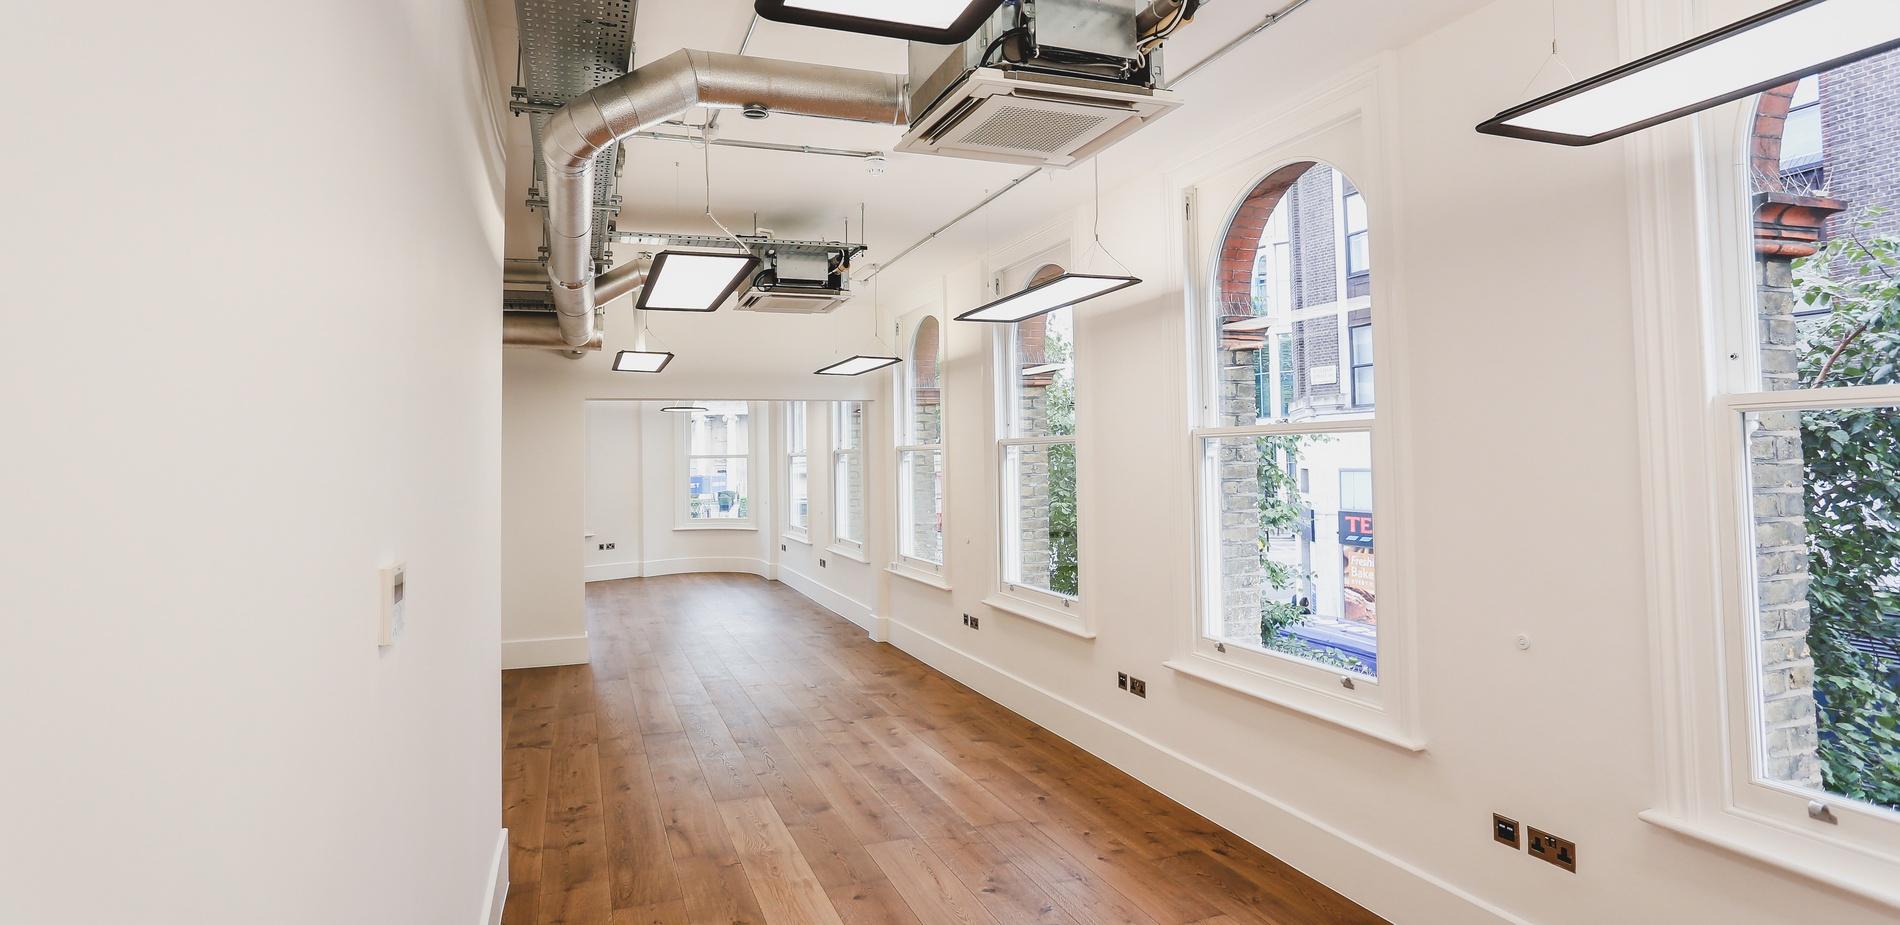 Timber Sash Windows Manufacturer - Central London - K&D Joinery